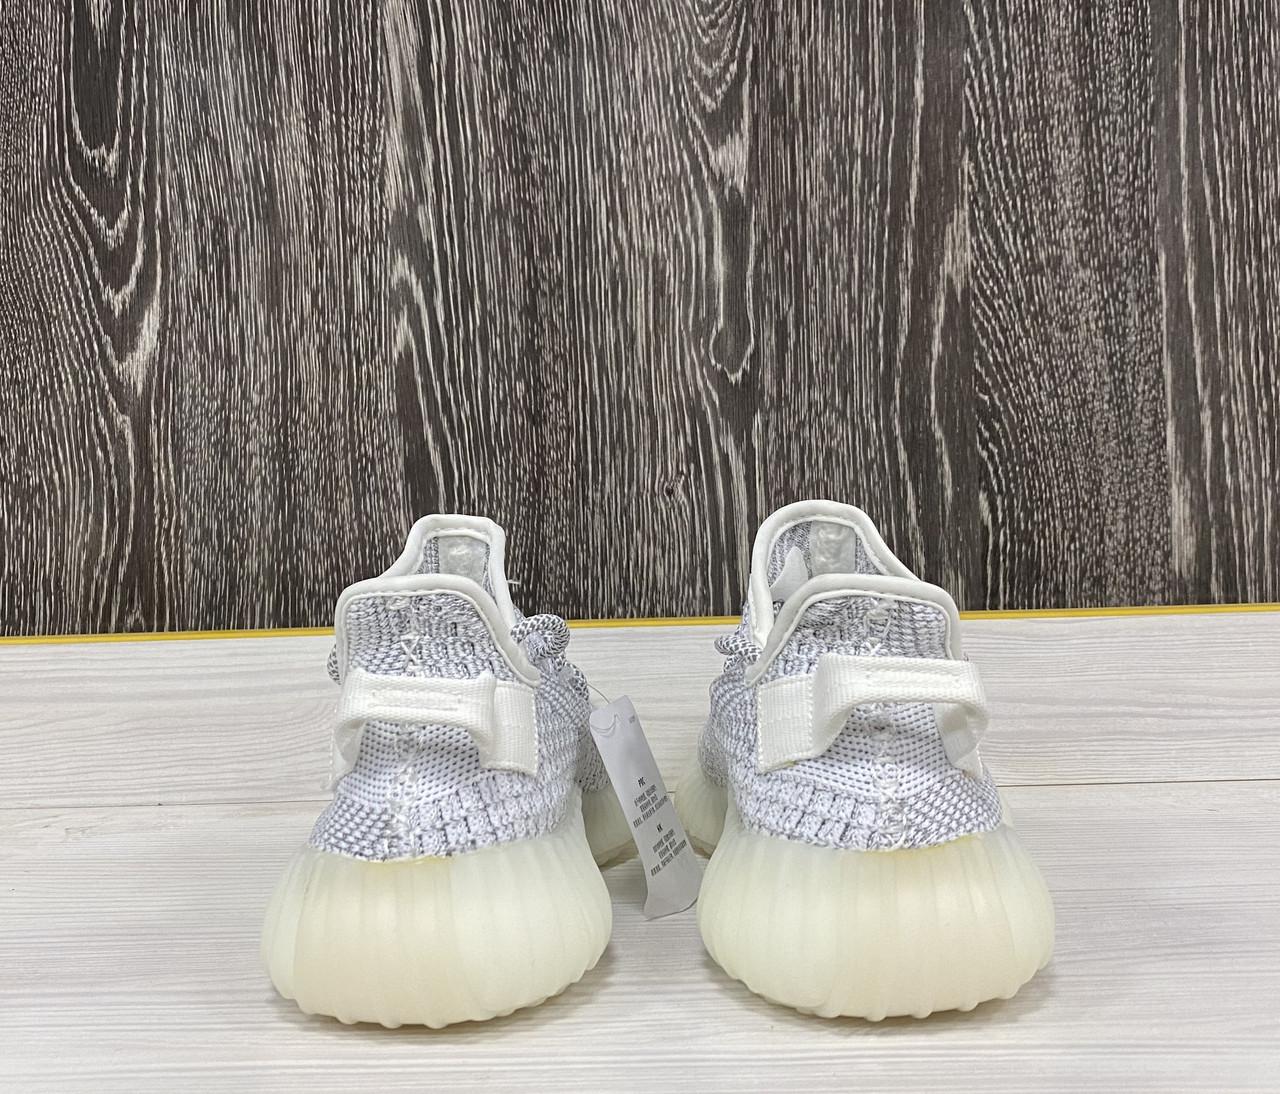 Кроссовки Adidas Yeezy Boost 350 V2 Static Reflective - фото 3